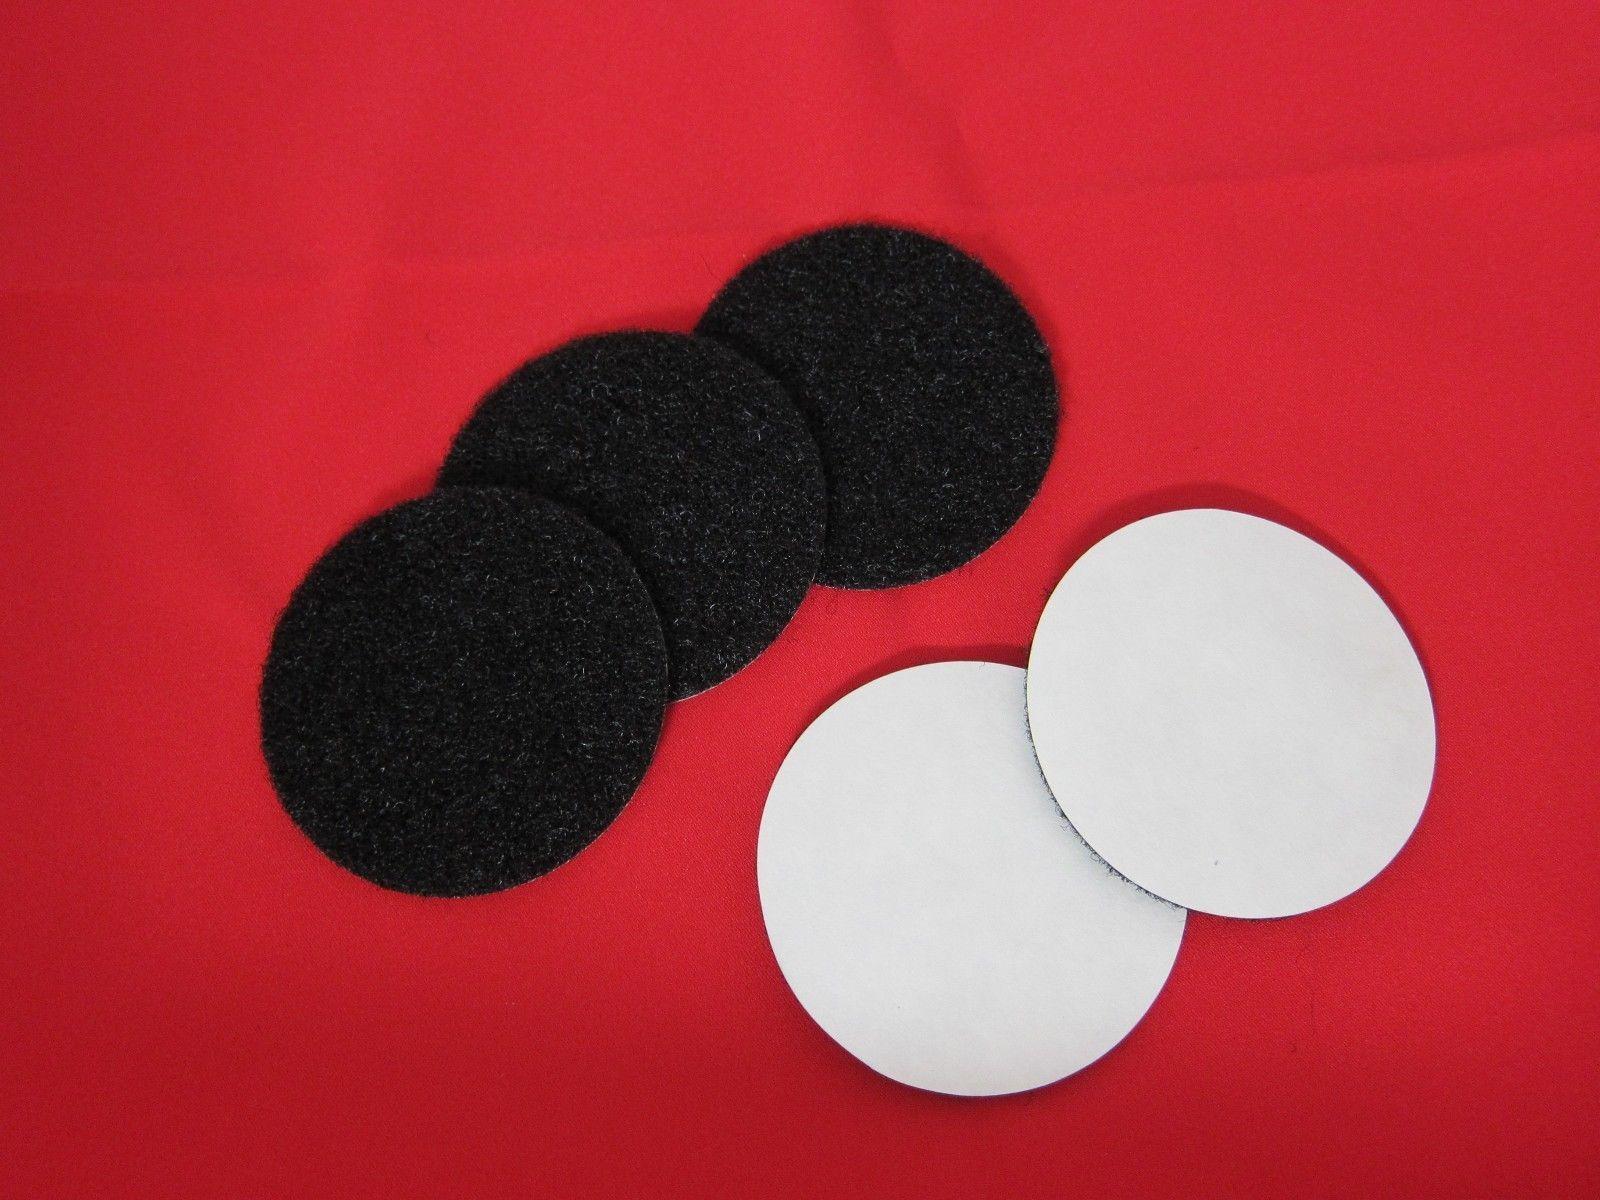 Felt Adhesive Circle Felt Dots Round Felt Pads Self Adhesive 60mm DIY | eBay US $4.9